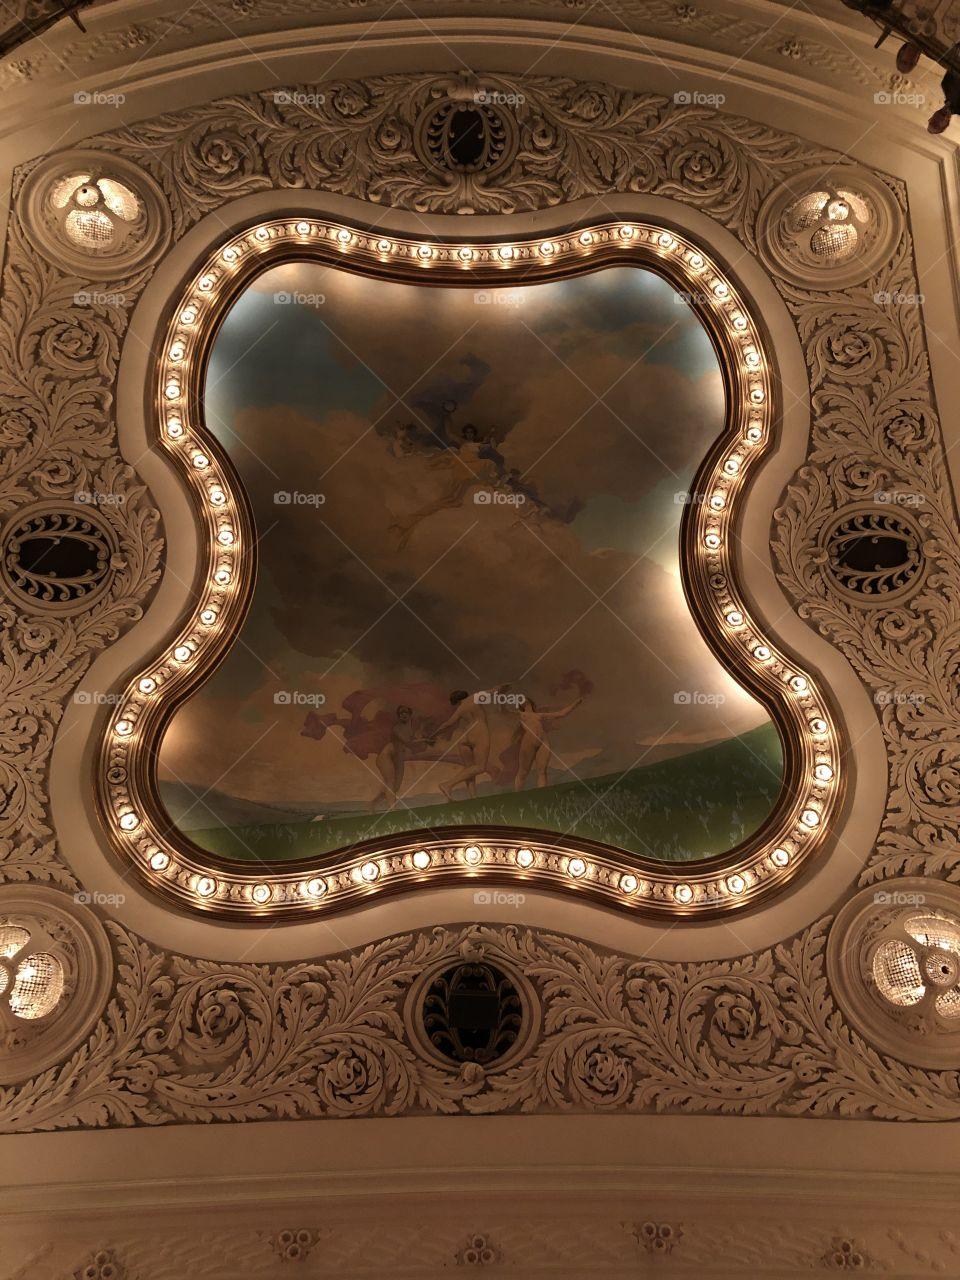 Jugend theatre in Stockholm